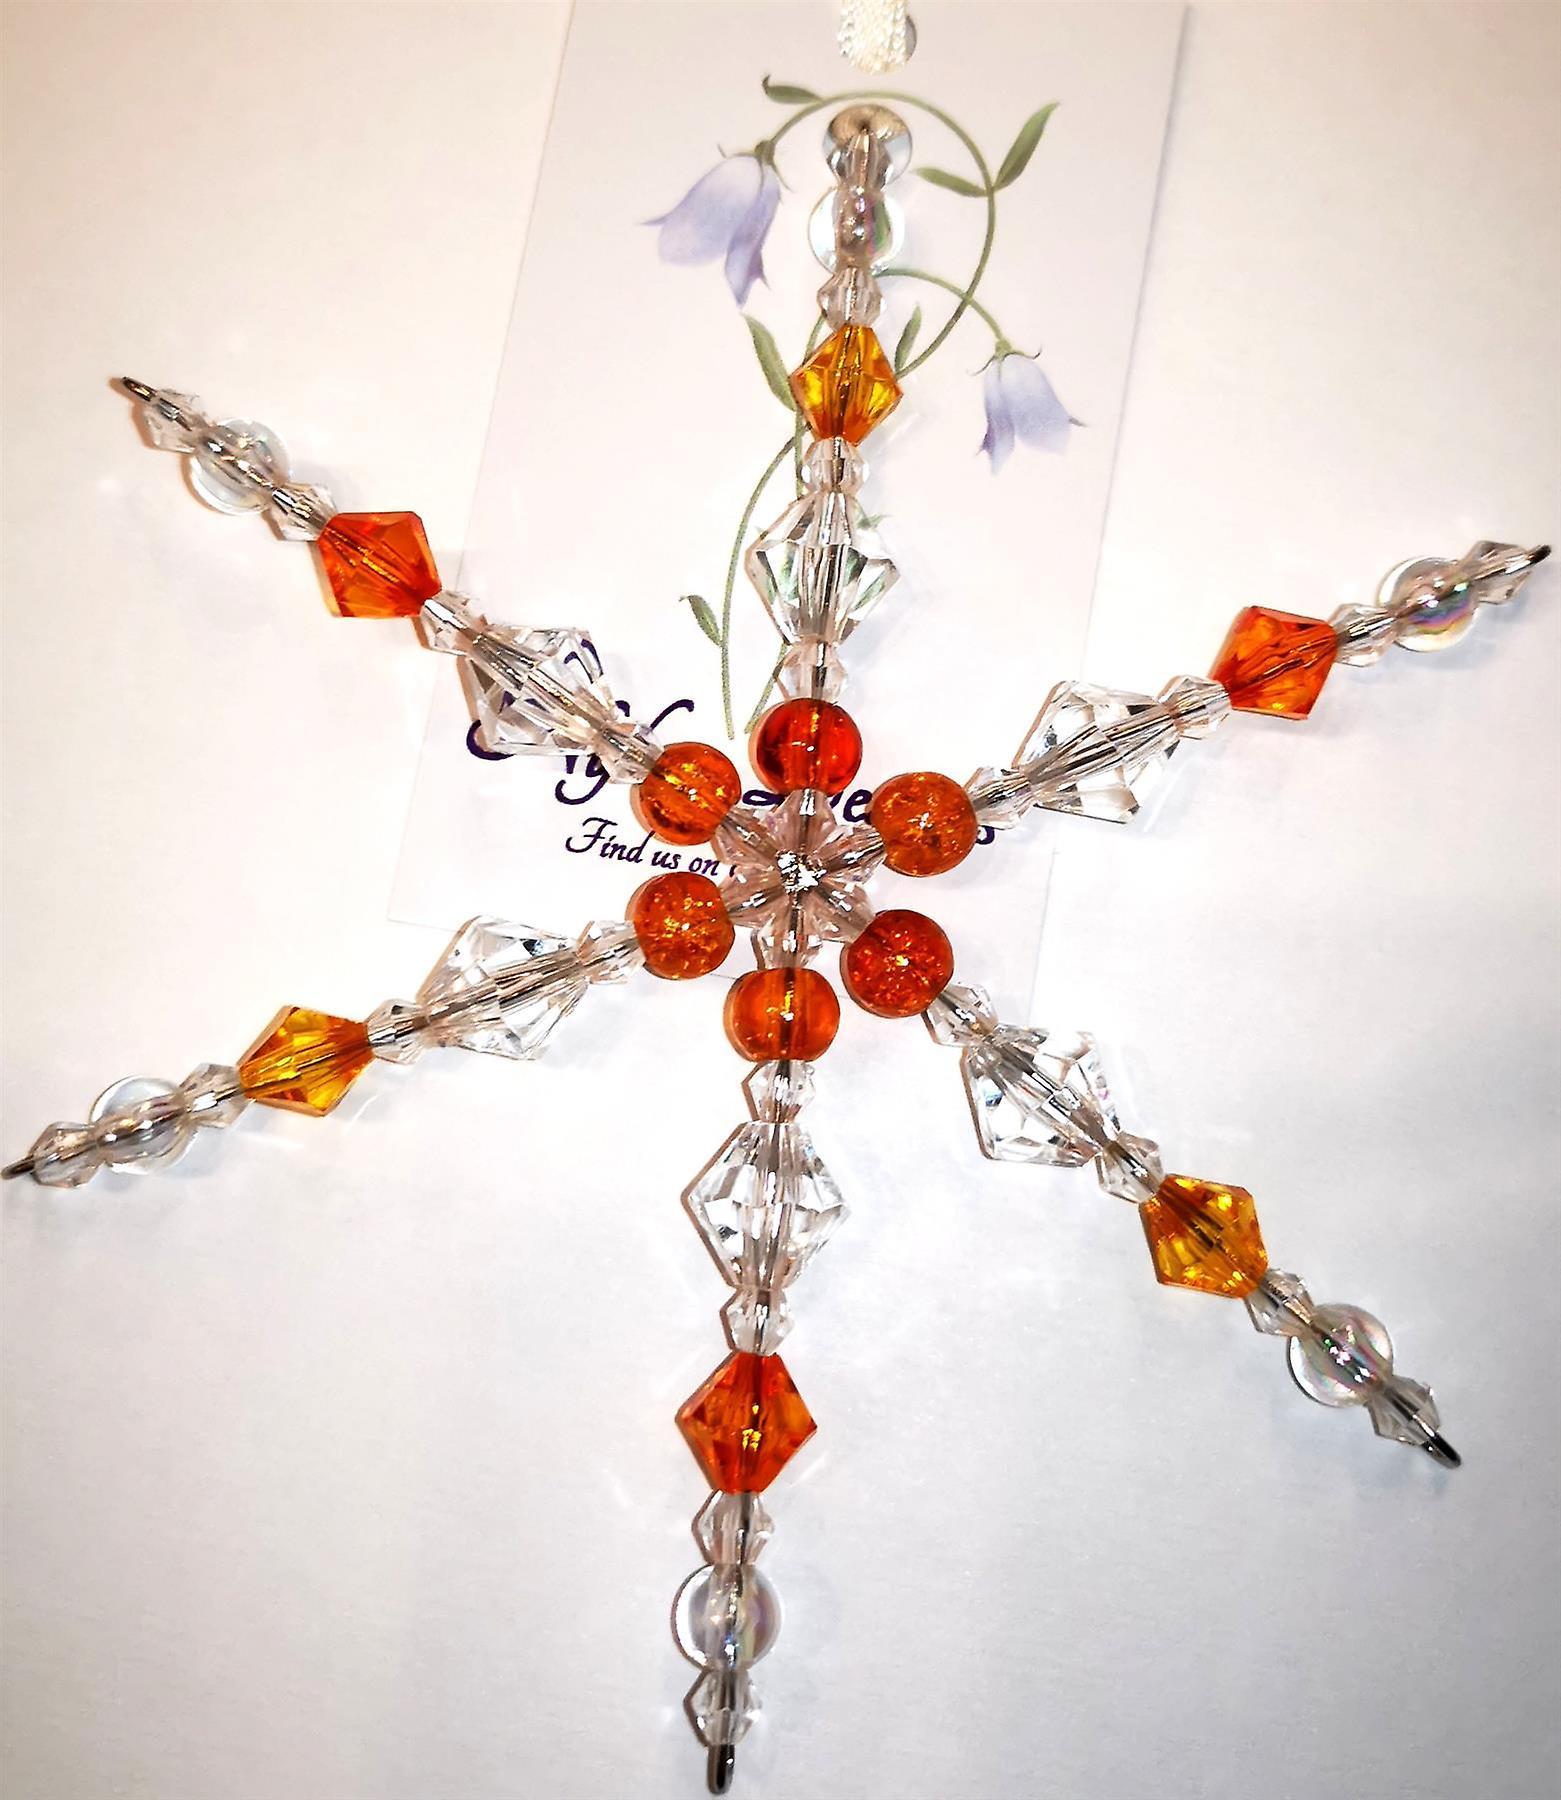 Nyleve Designs handmade hanging Snowflake decoration in orange/yellow